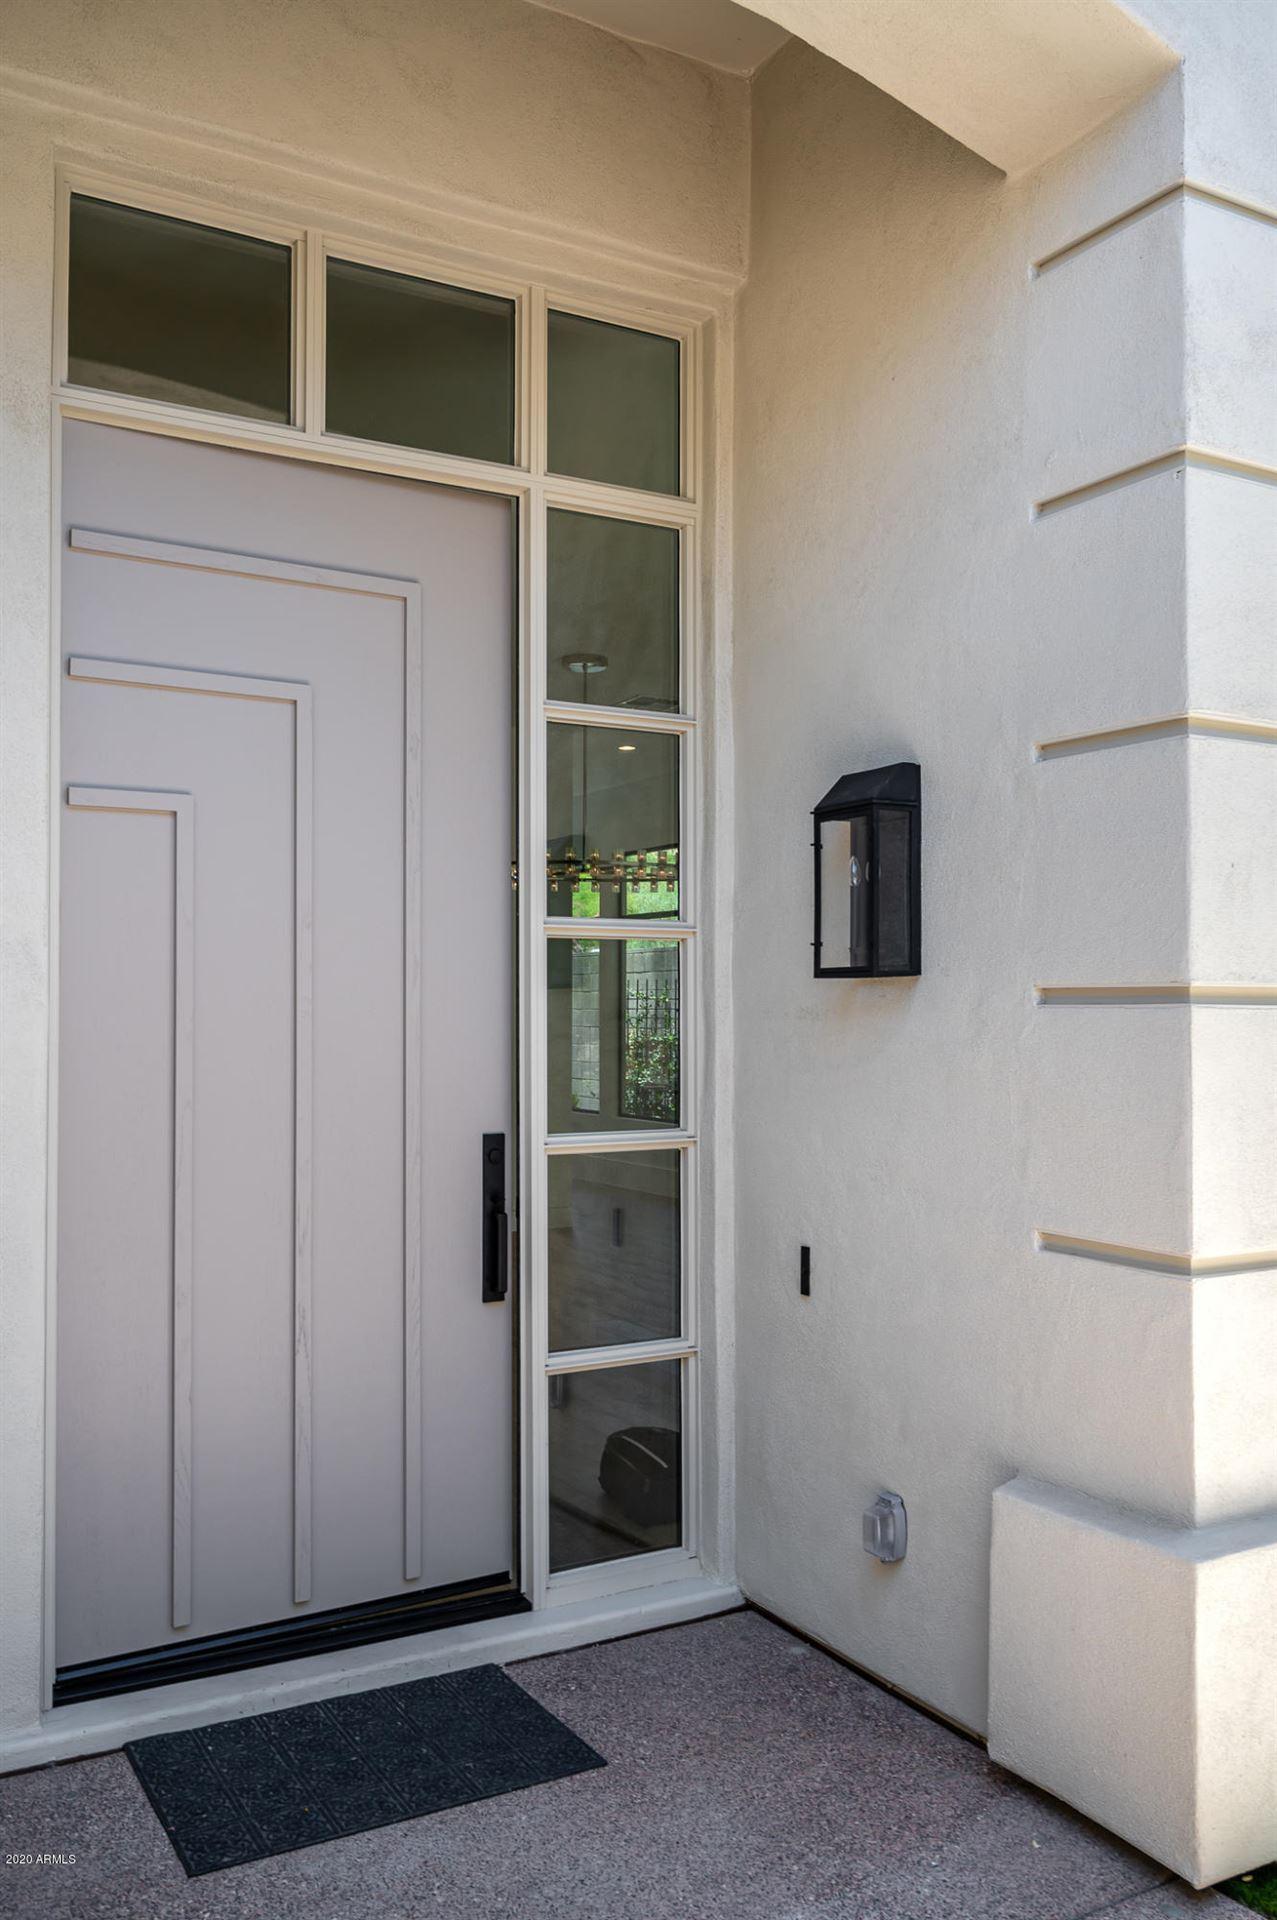 Property Image Of 6426 N 29Th Street In Phoenix, Az